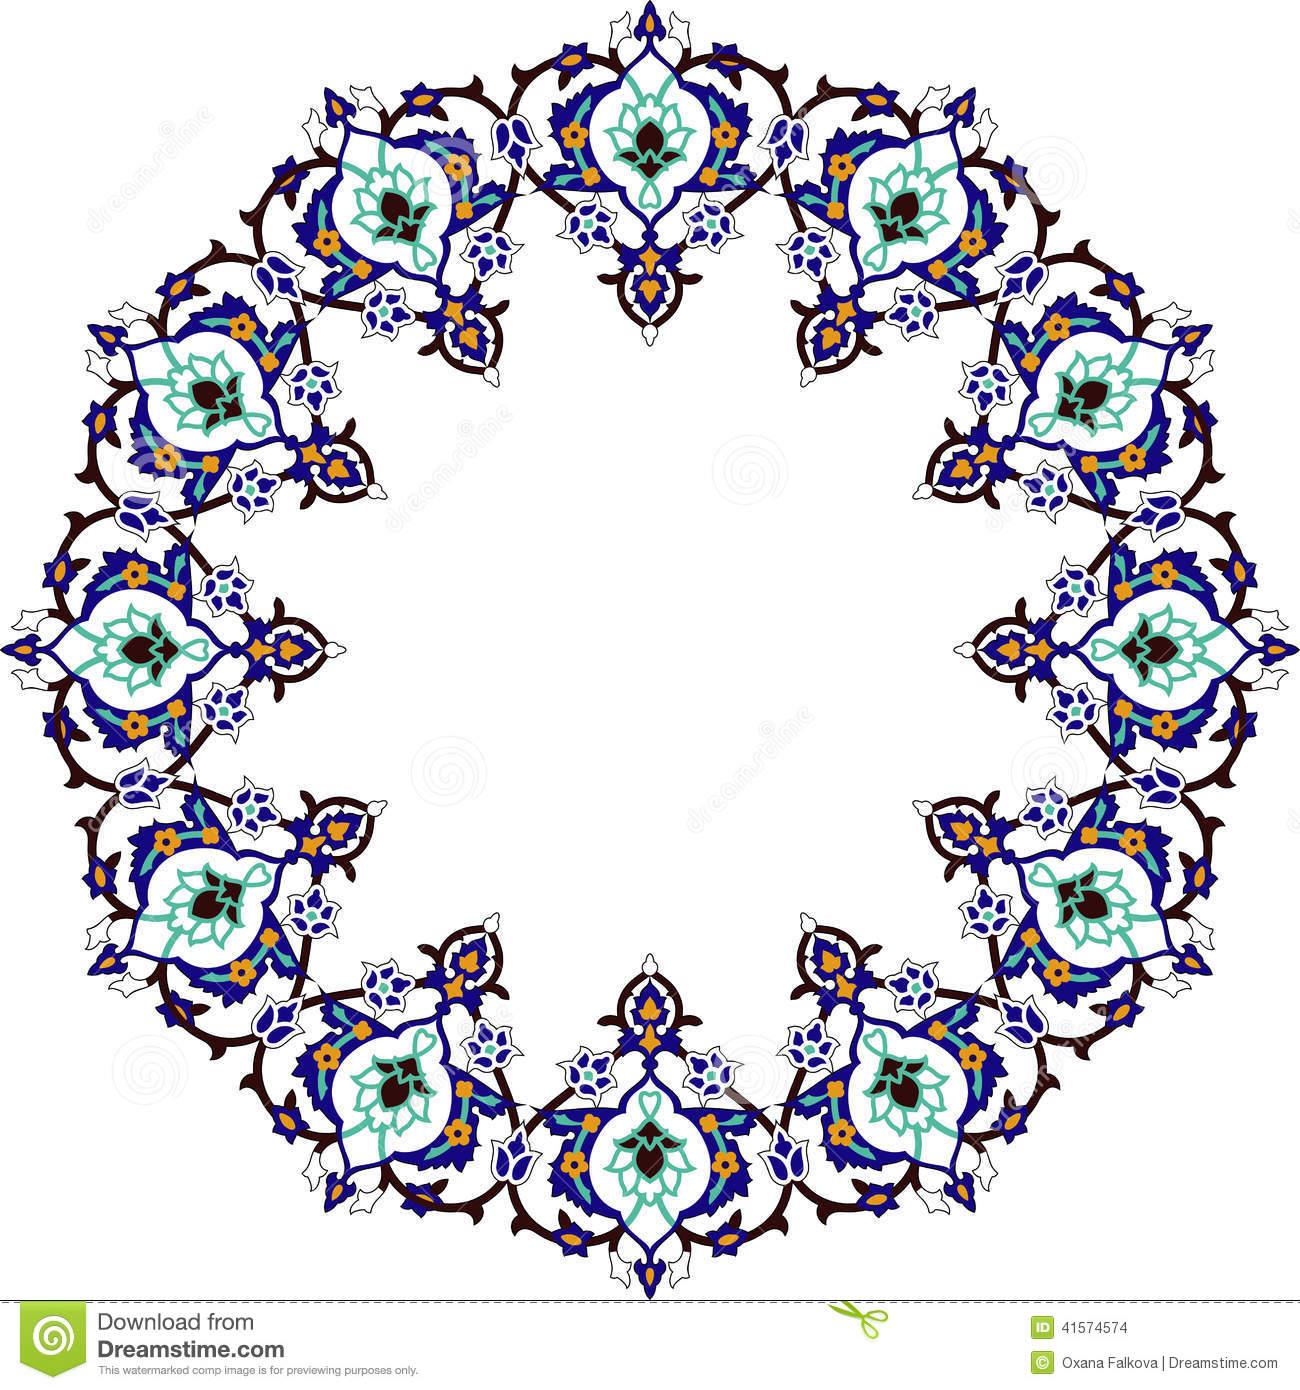 Arabic clipart clip art free Arabic Frame Stock Vector - Image: 41574574 clip art free